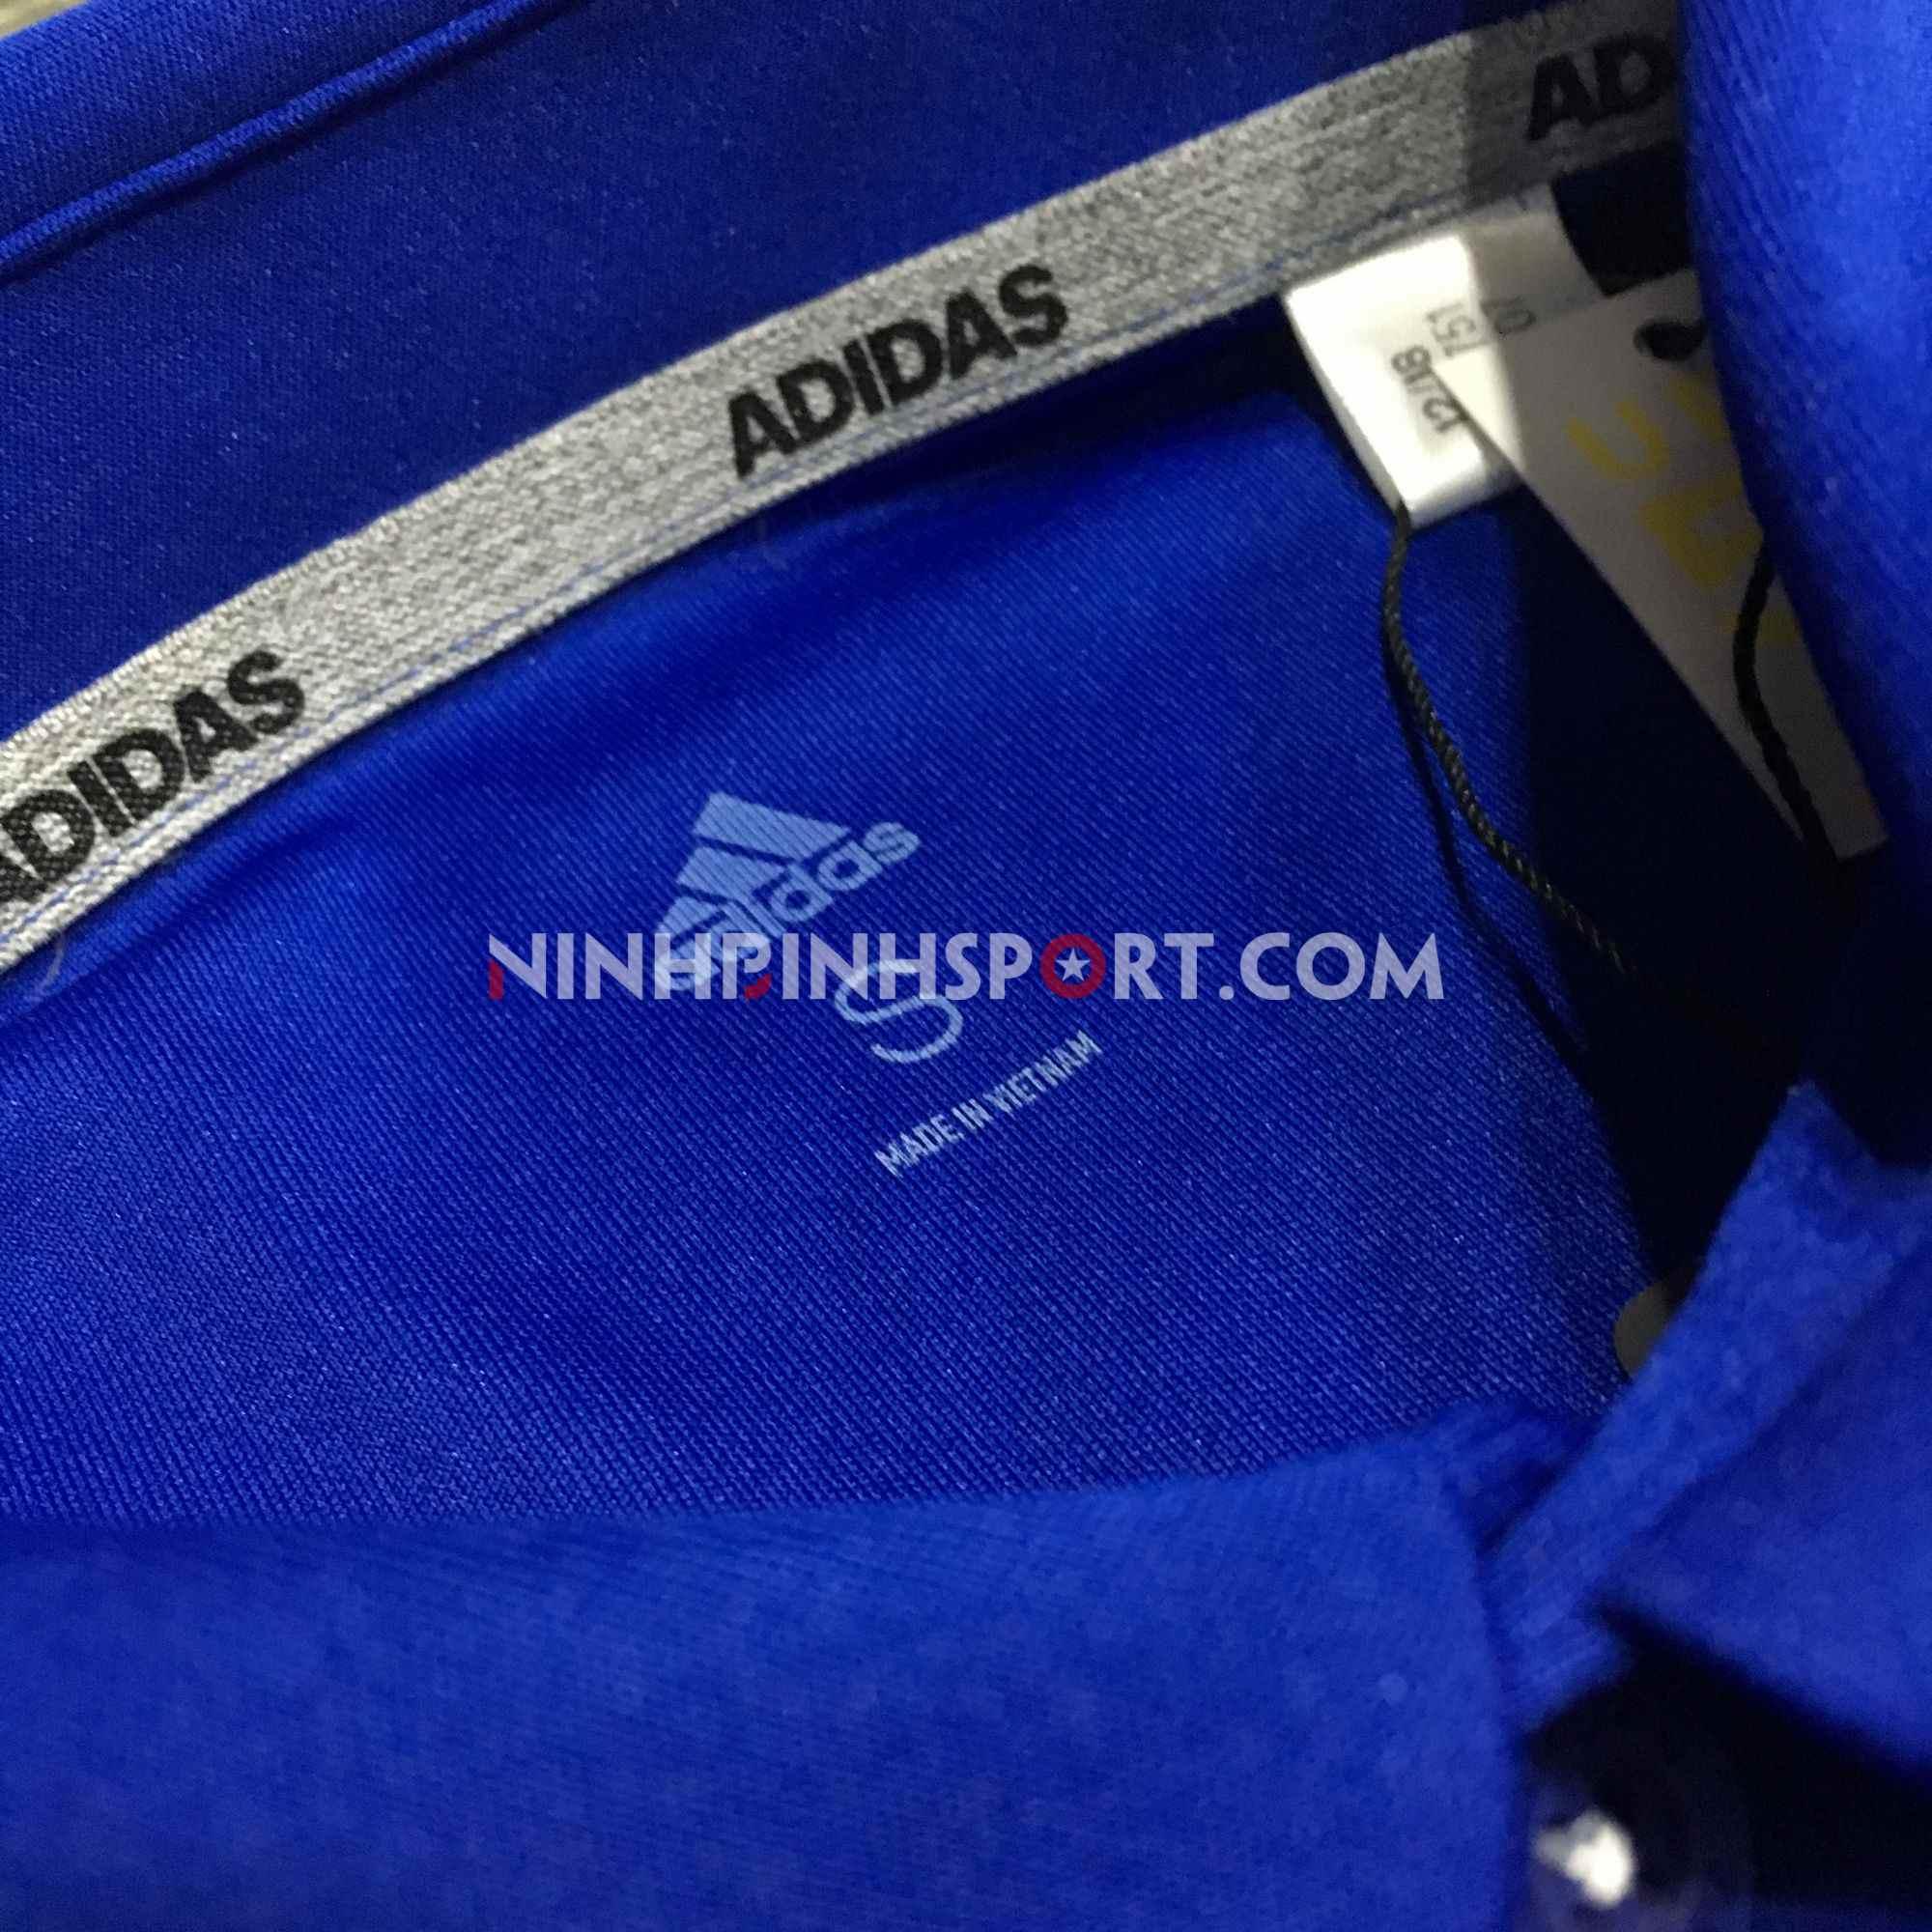 Áo thể thao nam Adidas Golf Polo Shirt-Blue DW5751